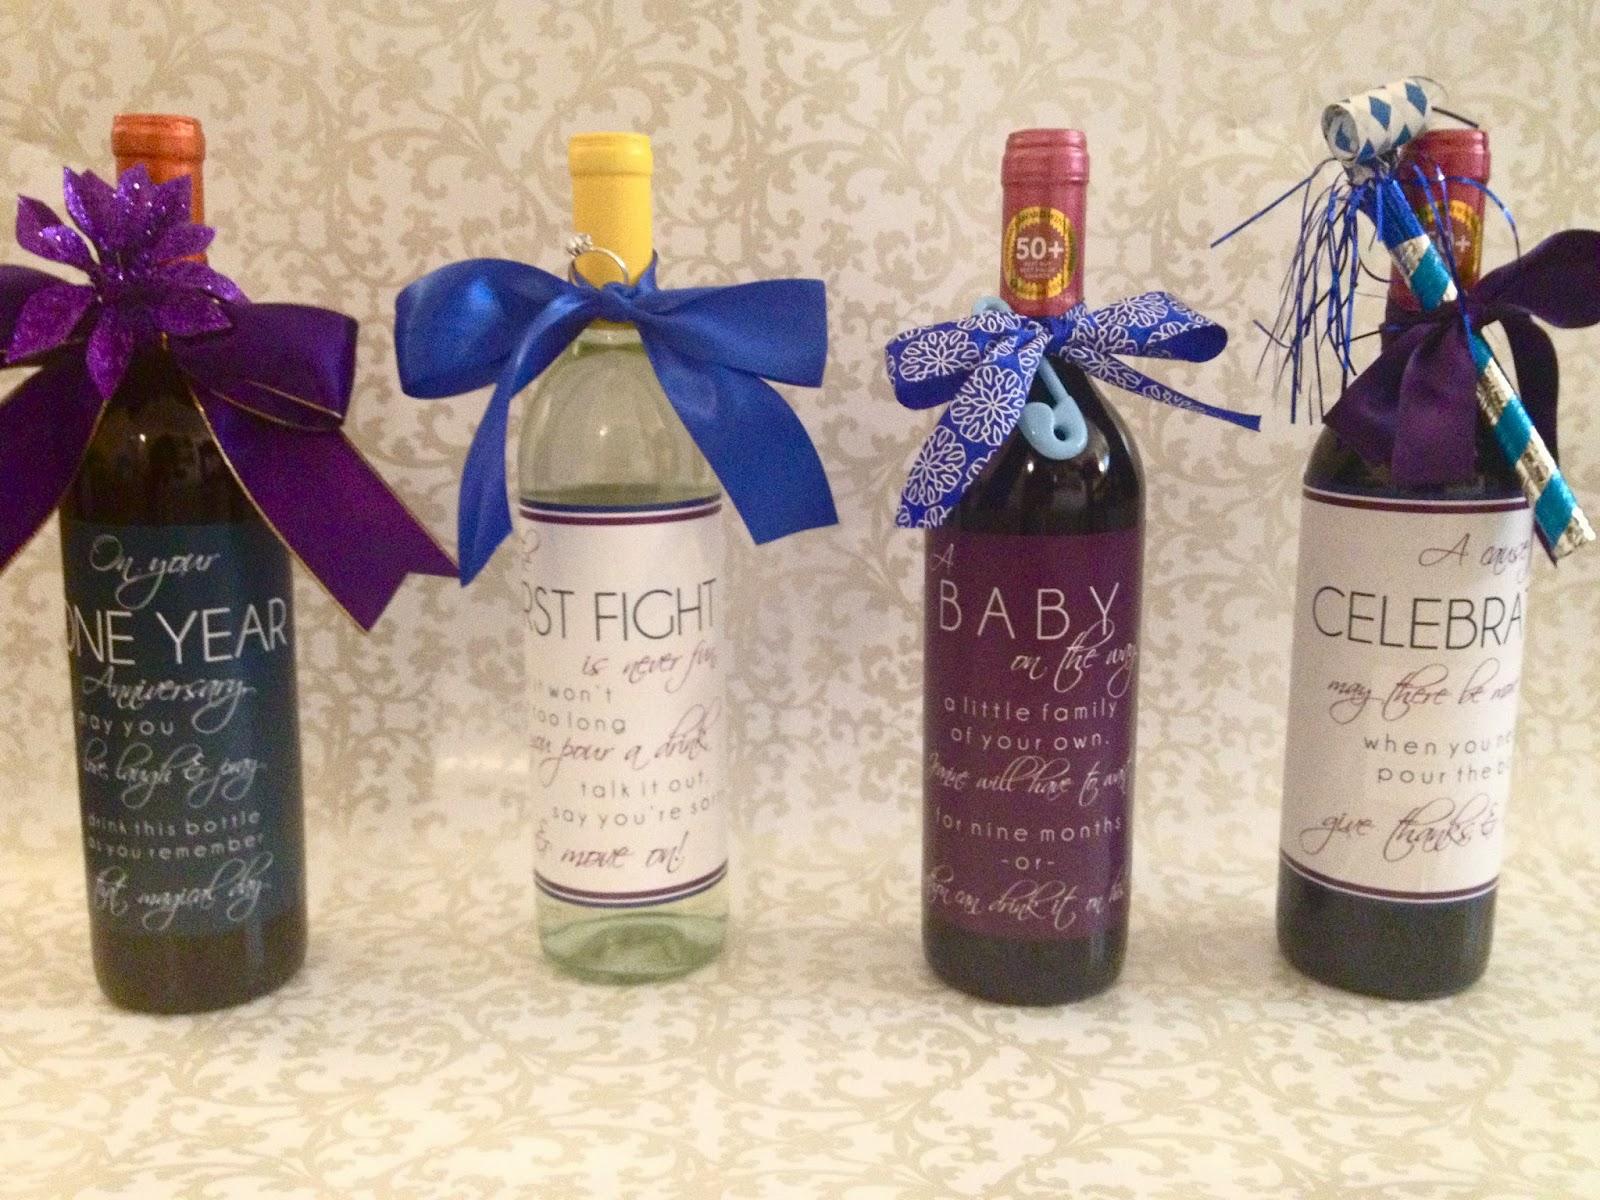 Meghan Henry Designs: Gift Idea: Personalized Wine Bottles